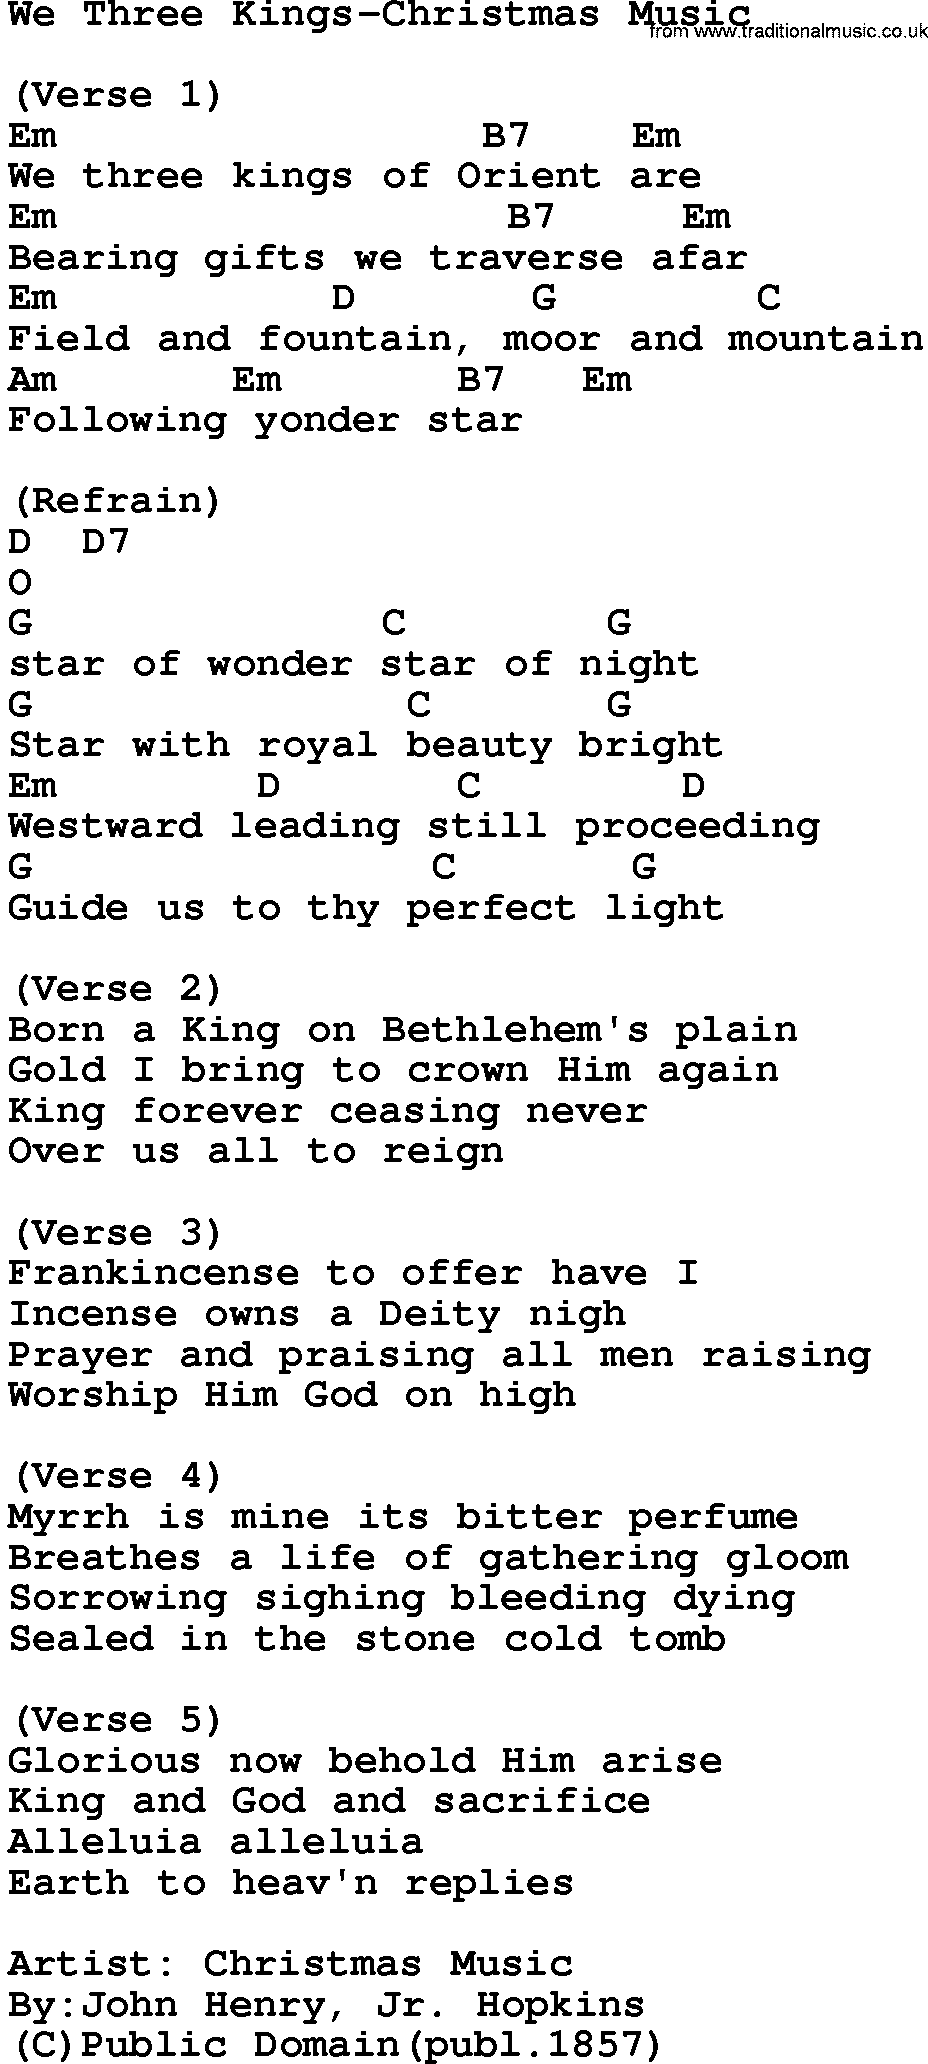 Music We Three Kings Song | Download: We Three Kings-Christmas Music ...